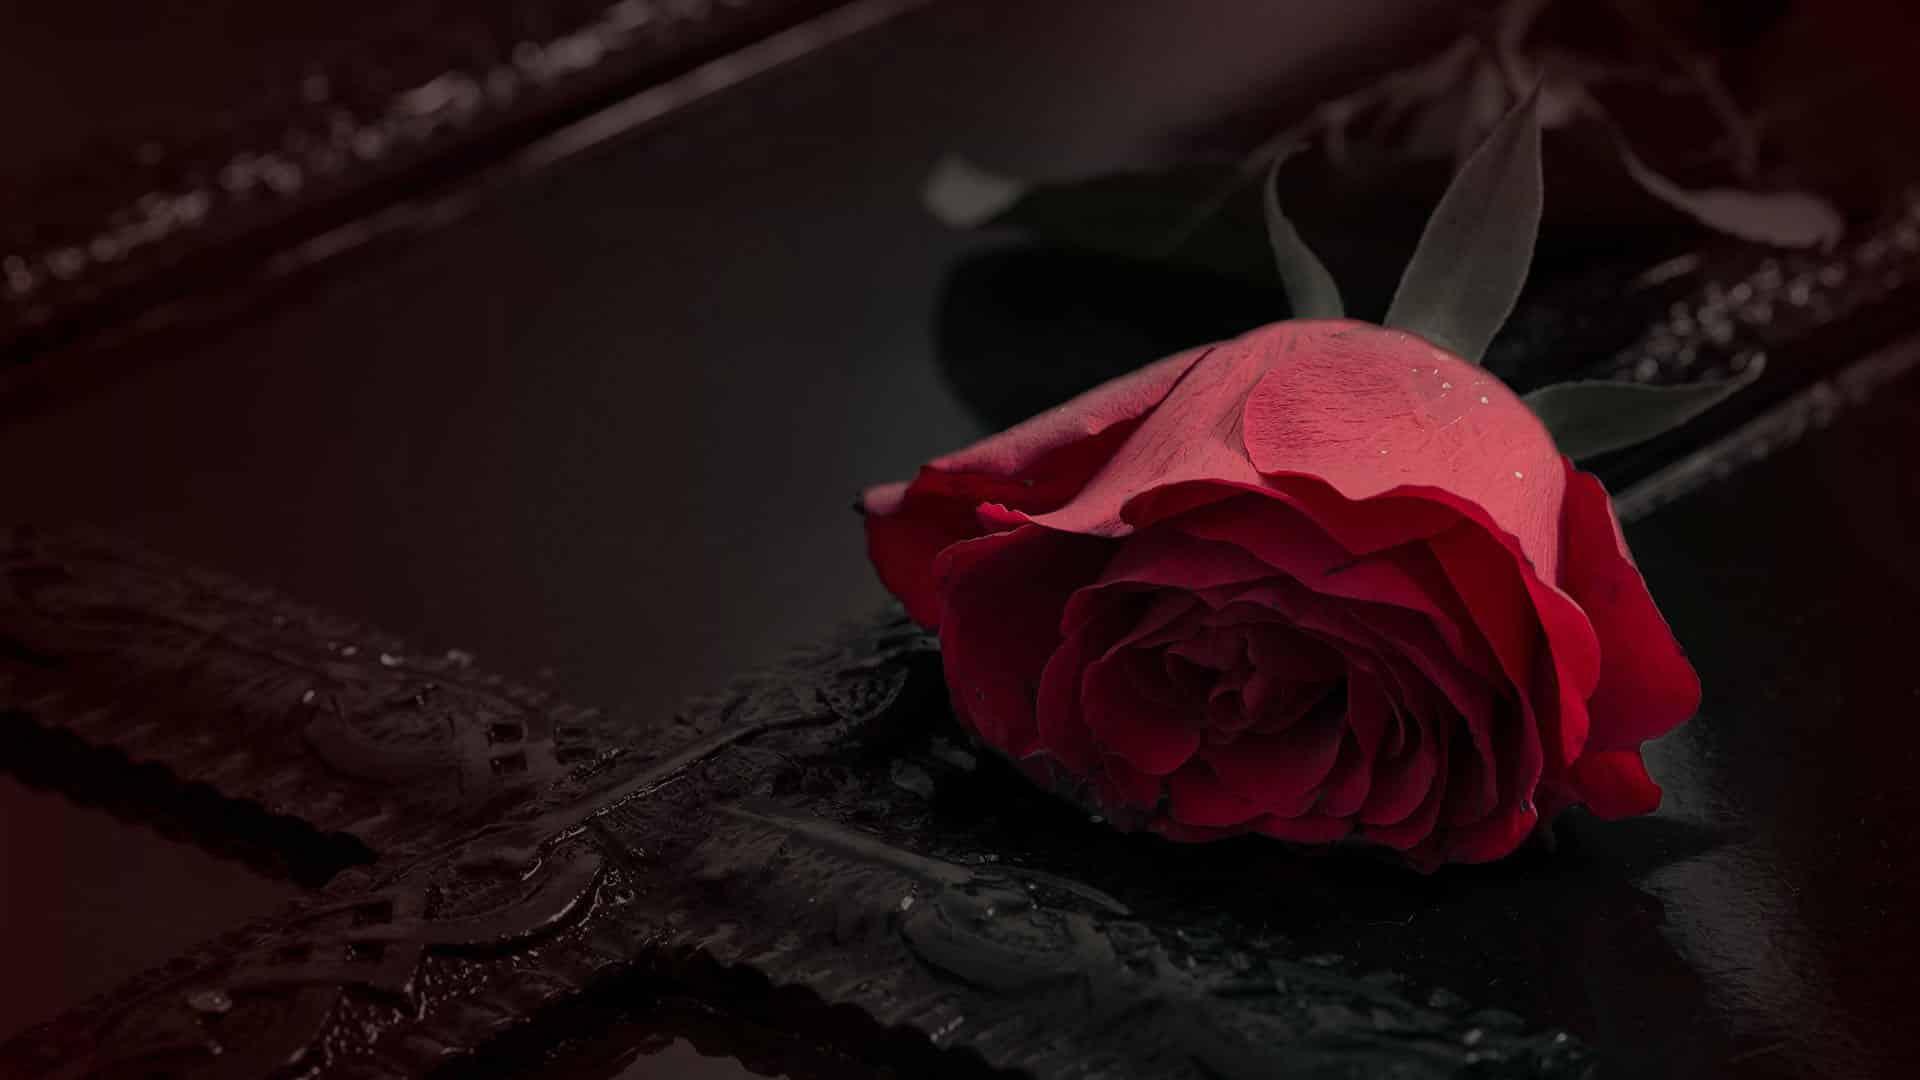 Onoranze funebri Meneghini Arsiero